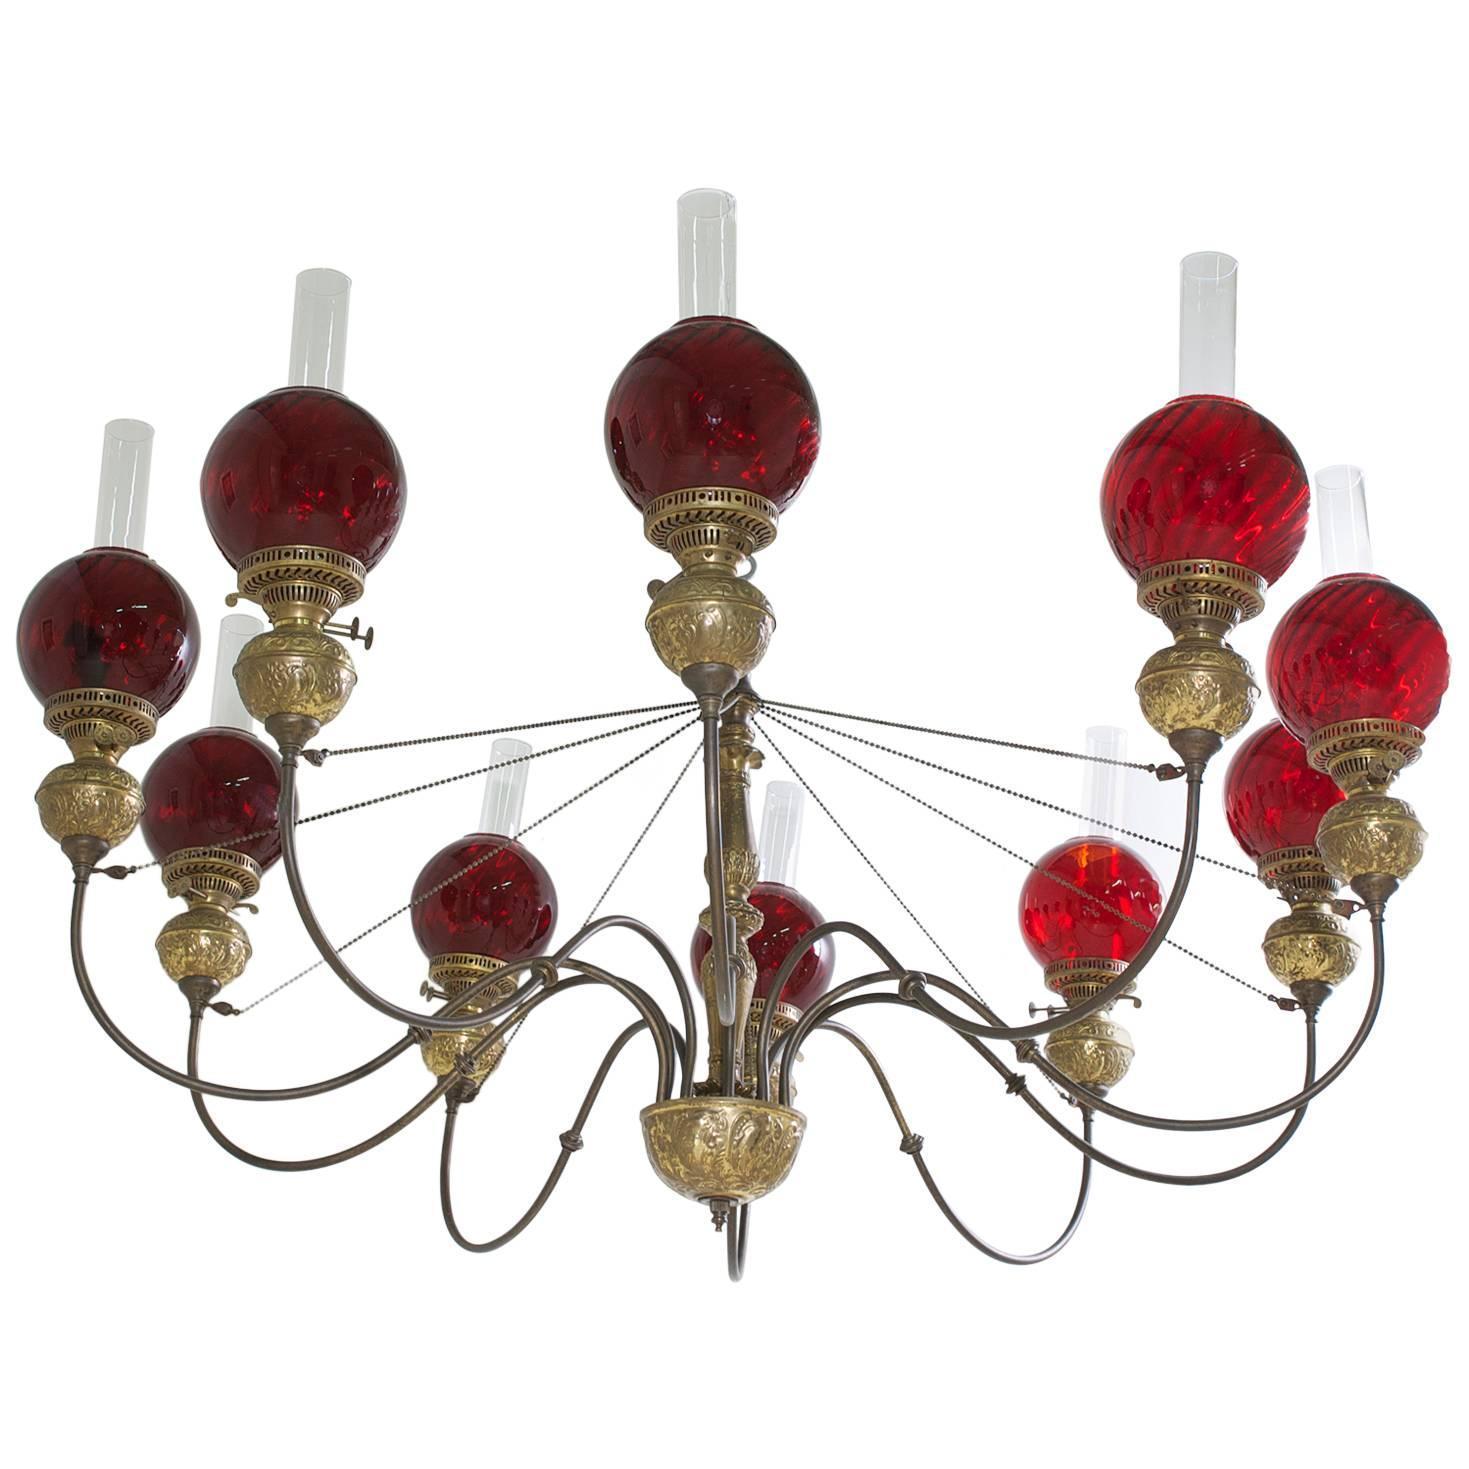 English victorian ten light chandelier in brass with cranberry english victorian ten light chandelier in brass with cranberry glass globes arubaitofo Gallery